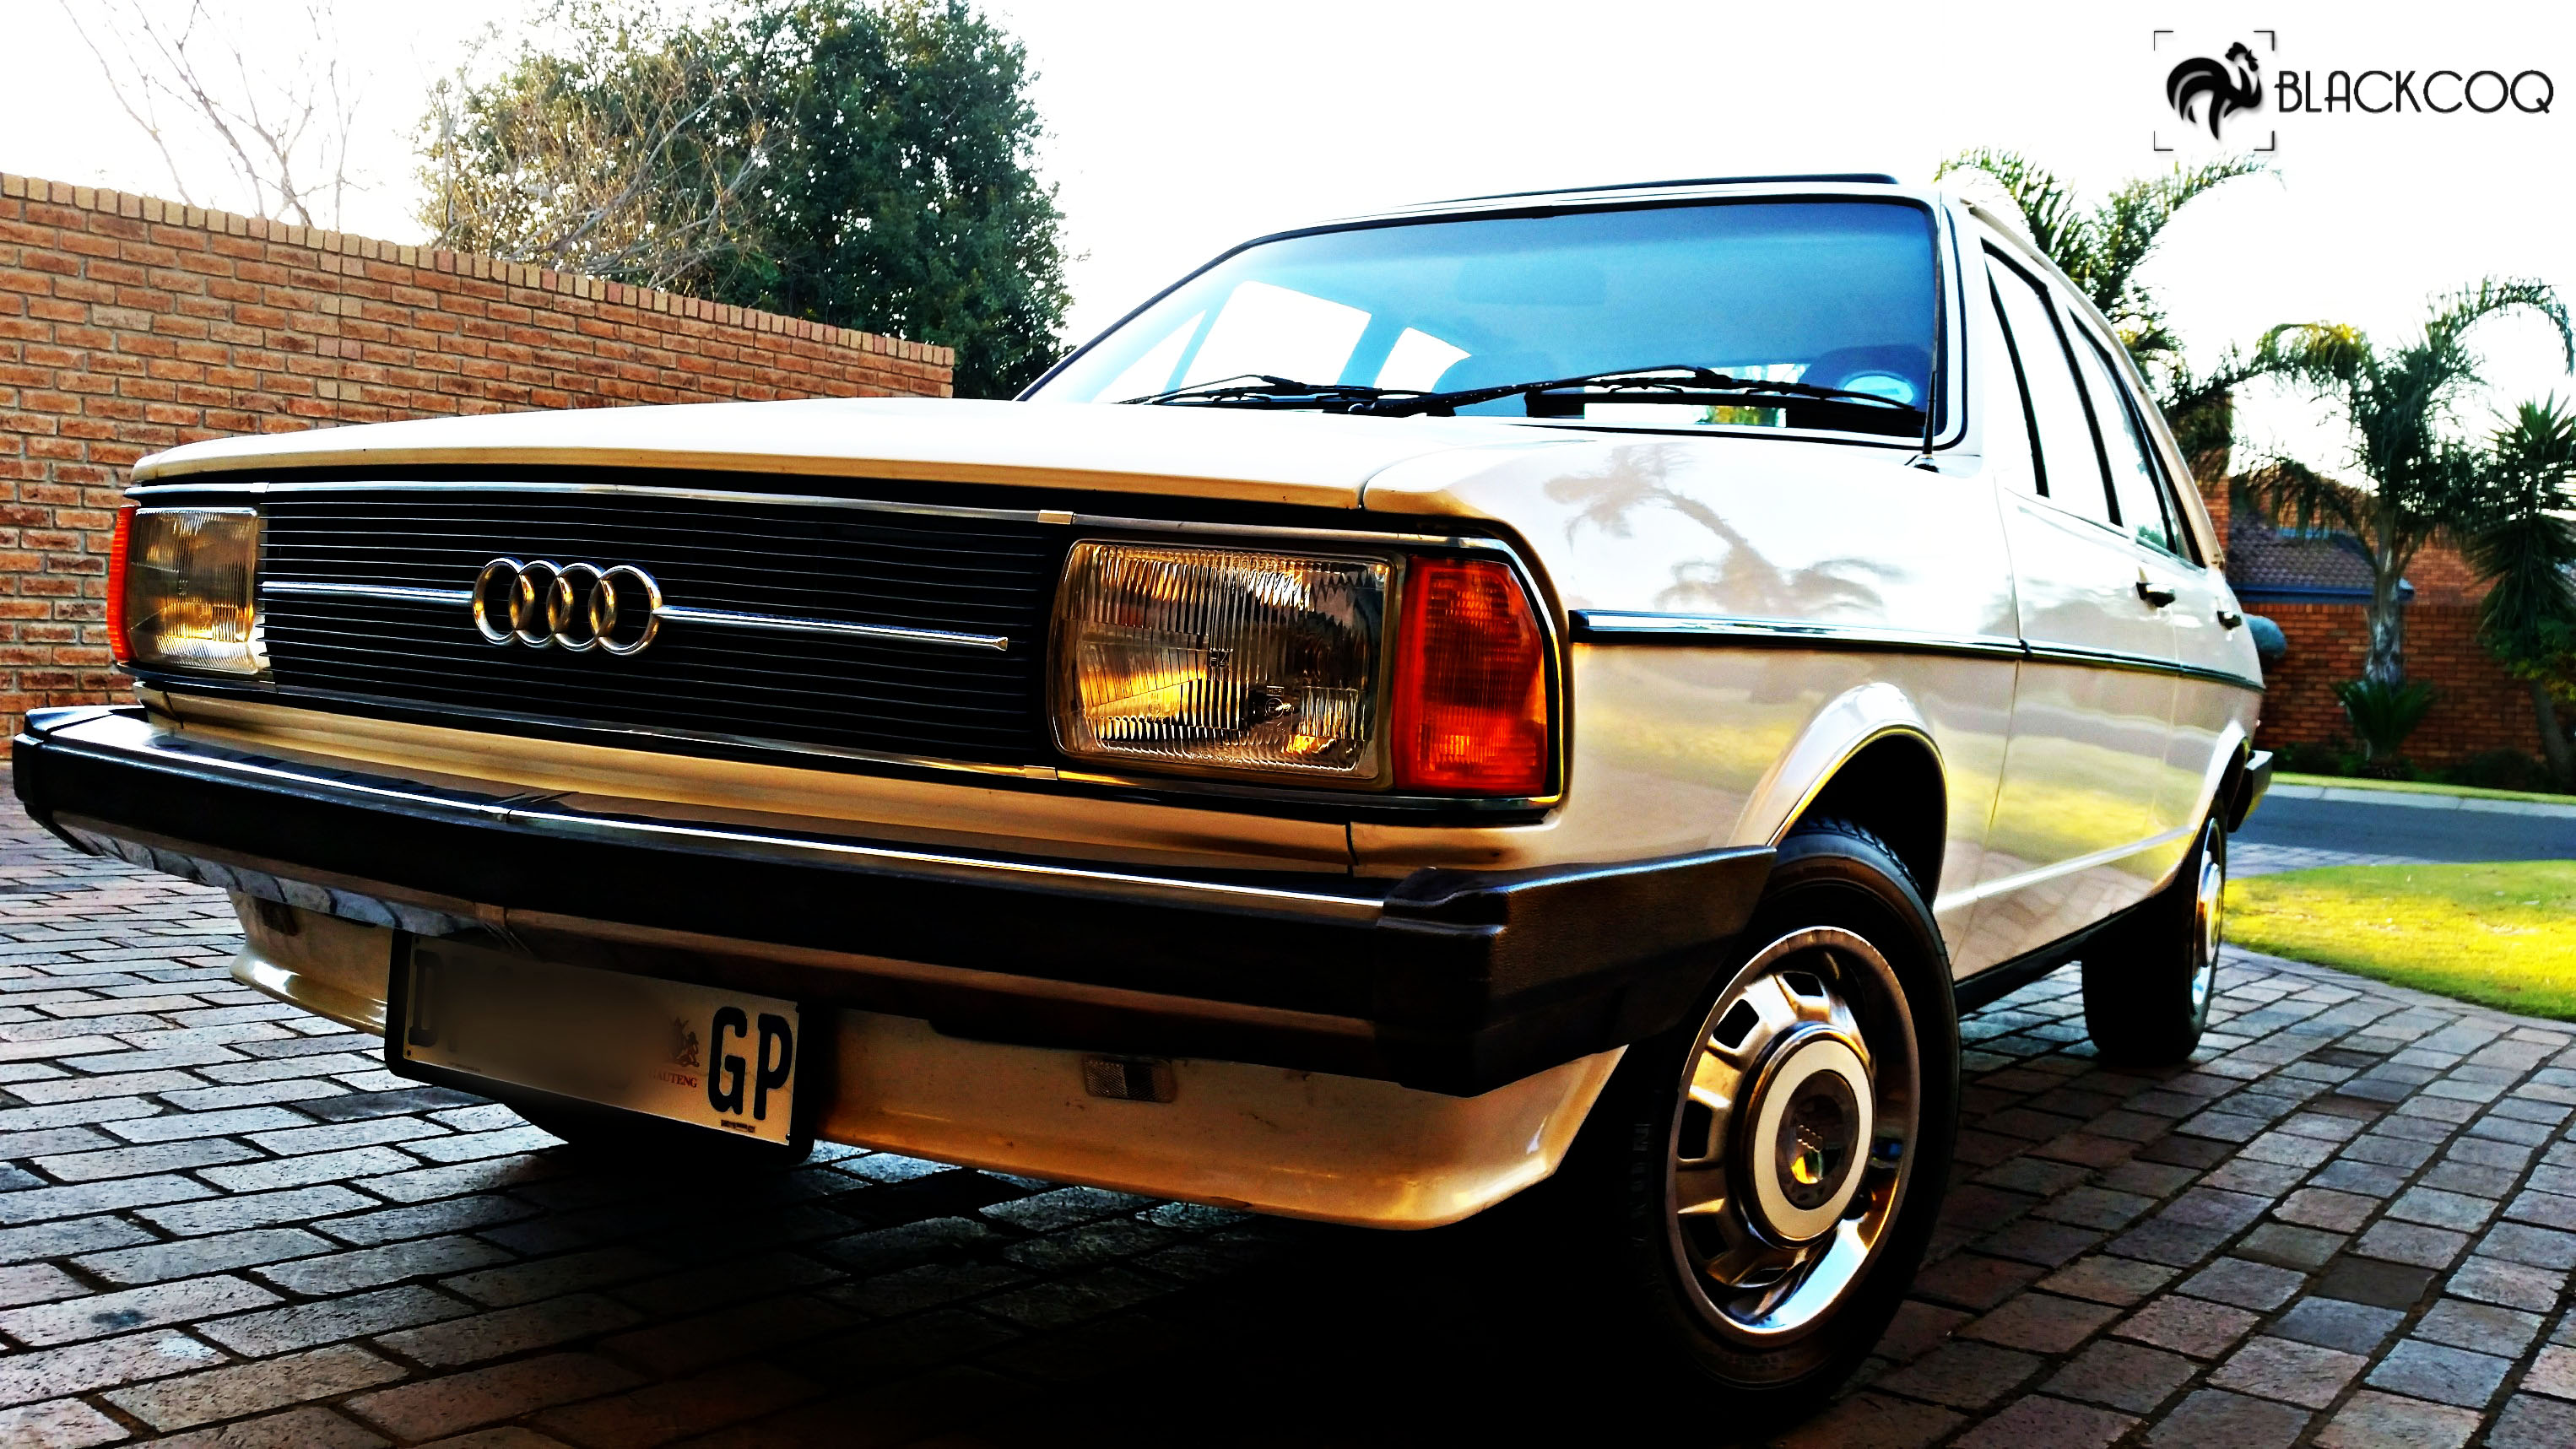 Kelebihan Audi 1980 Review